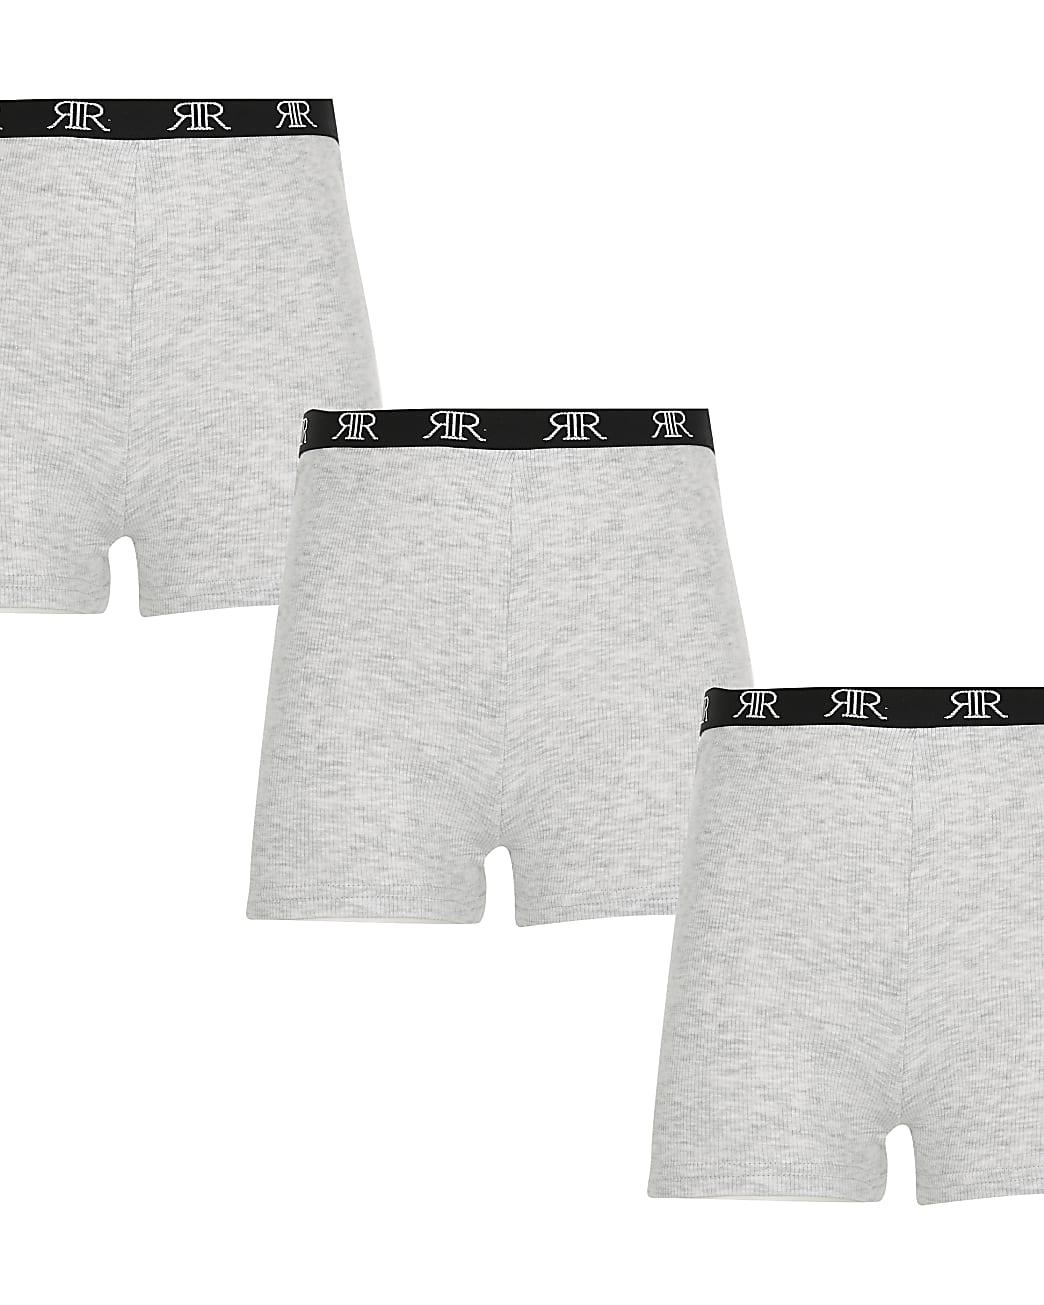 Girls grey RI modesty shorts 3 pack